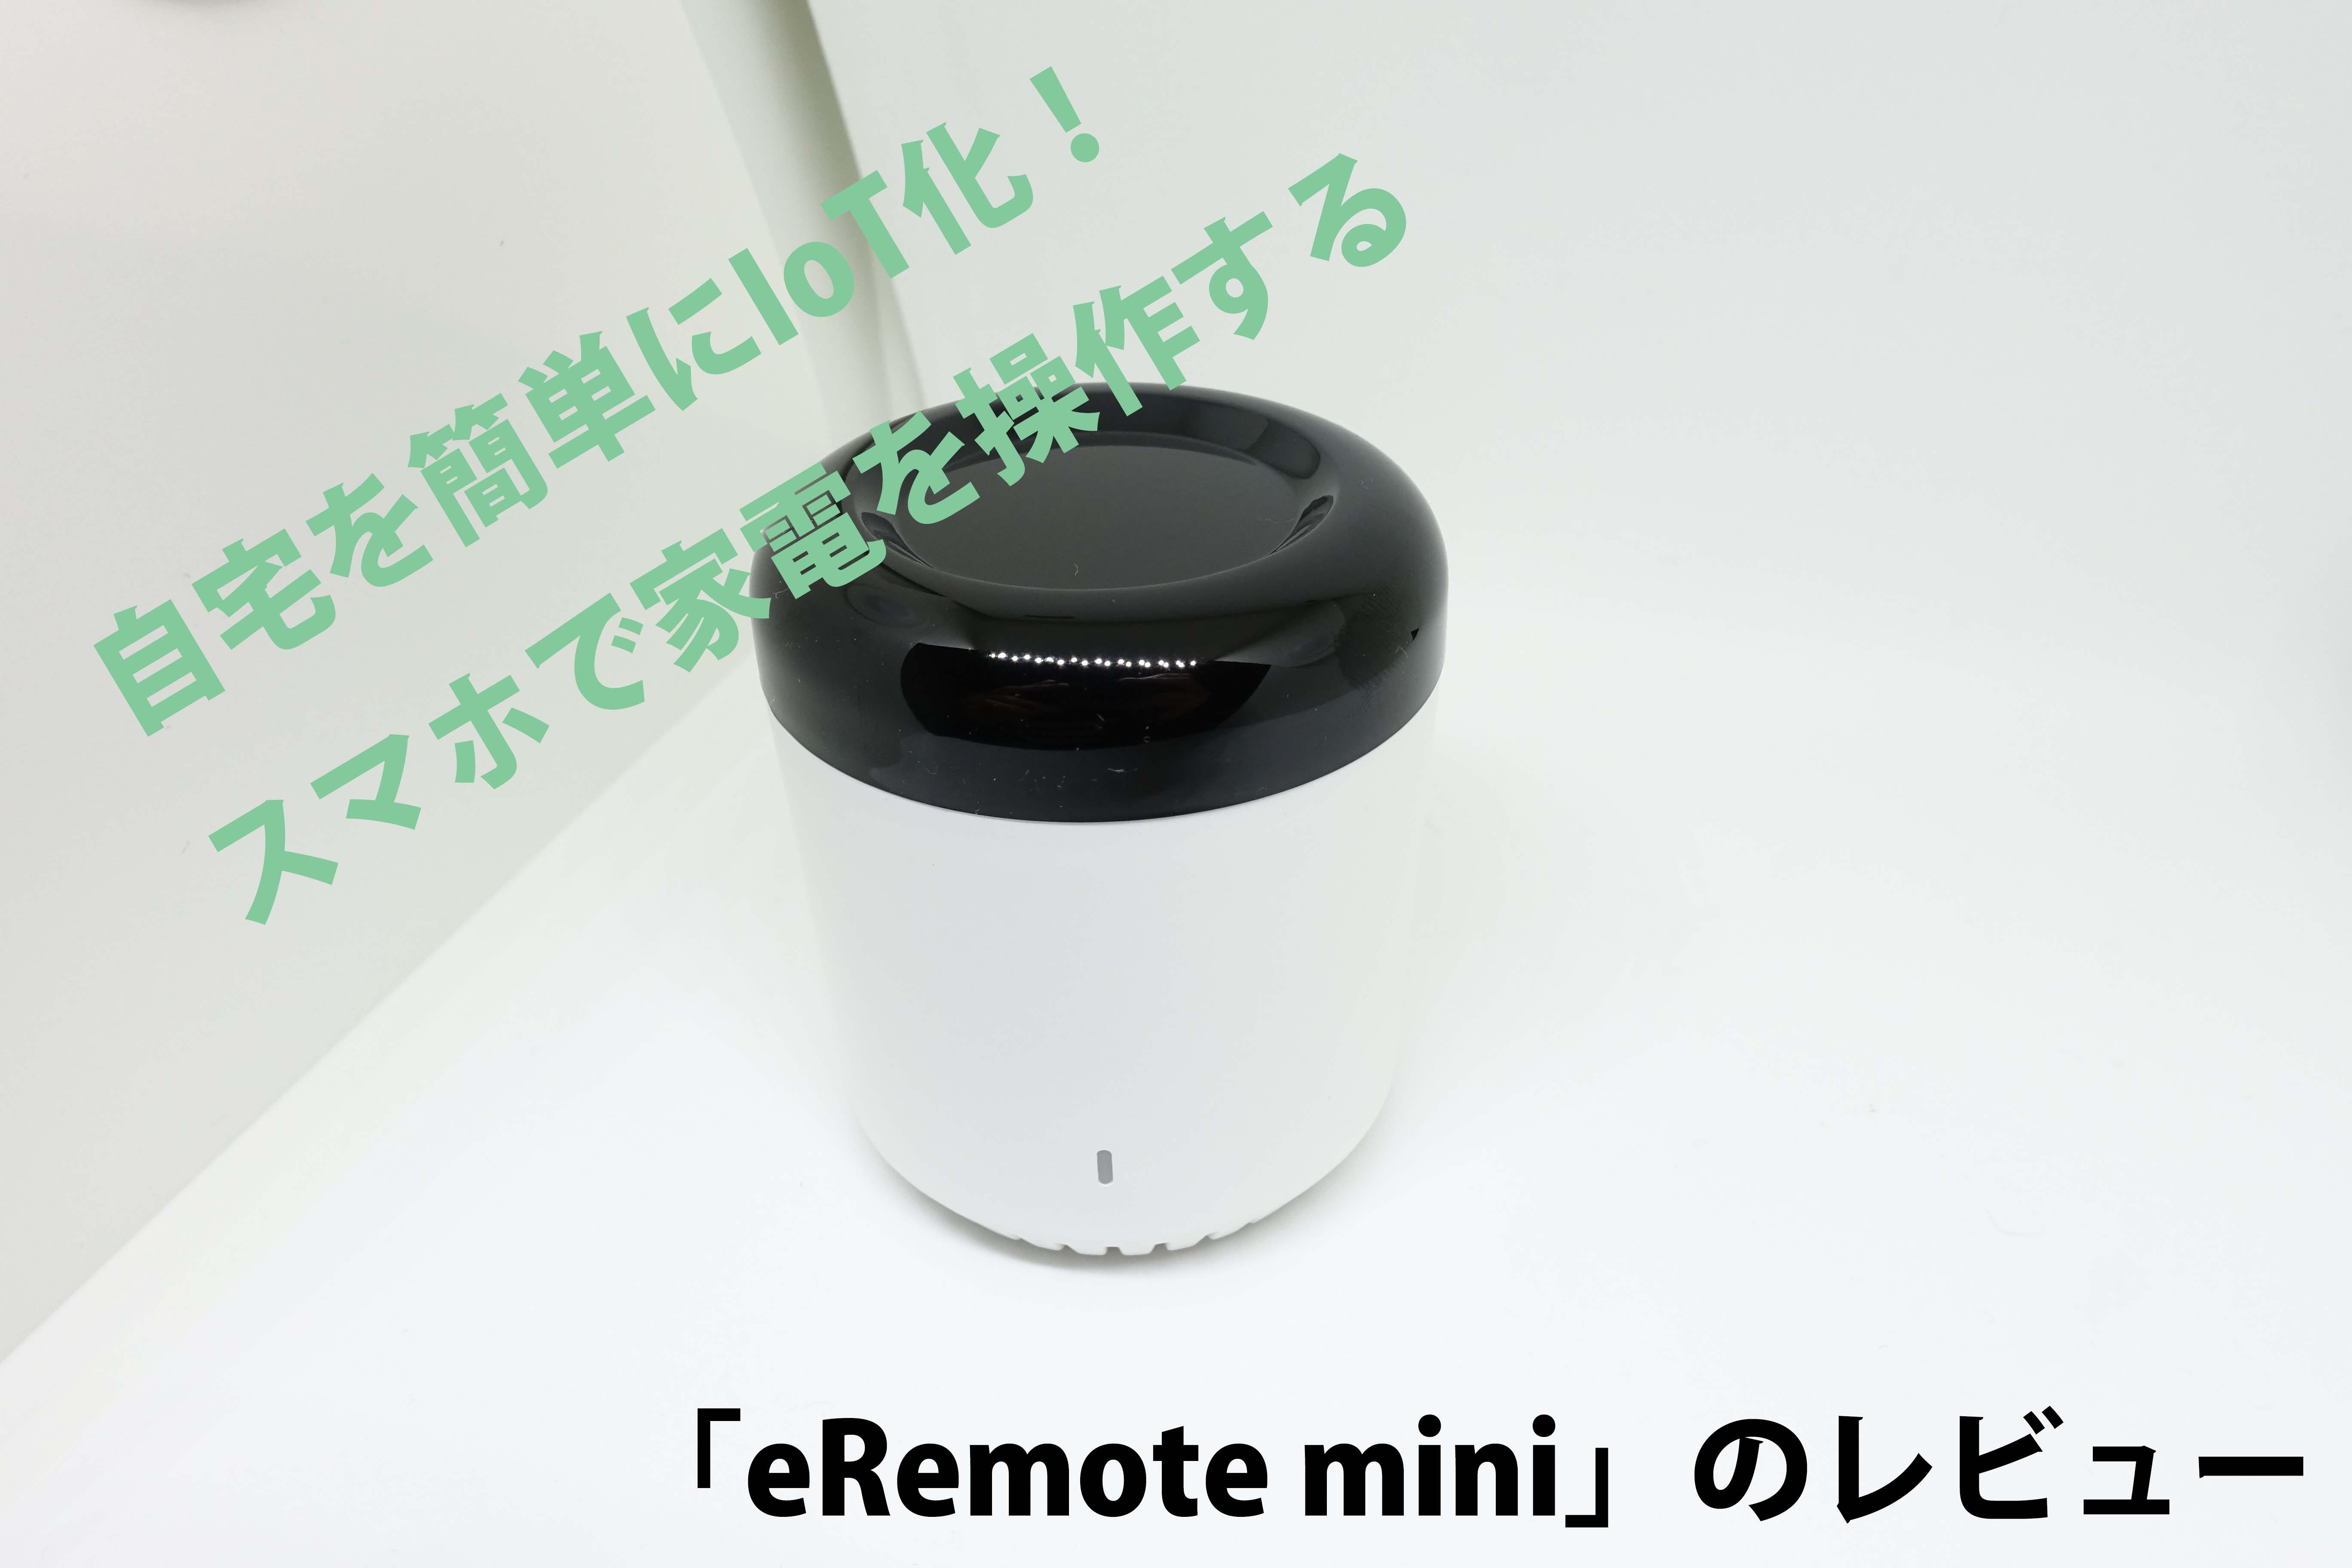 【Iレビュー】自宅を簡単にIoT化!スマホで家電を操作する「eRemote mini」が超便利